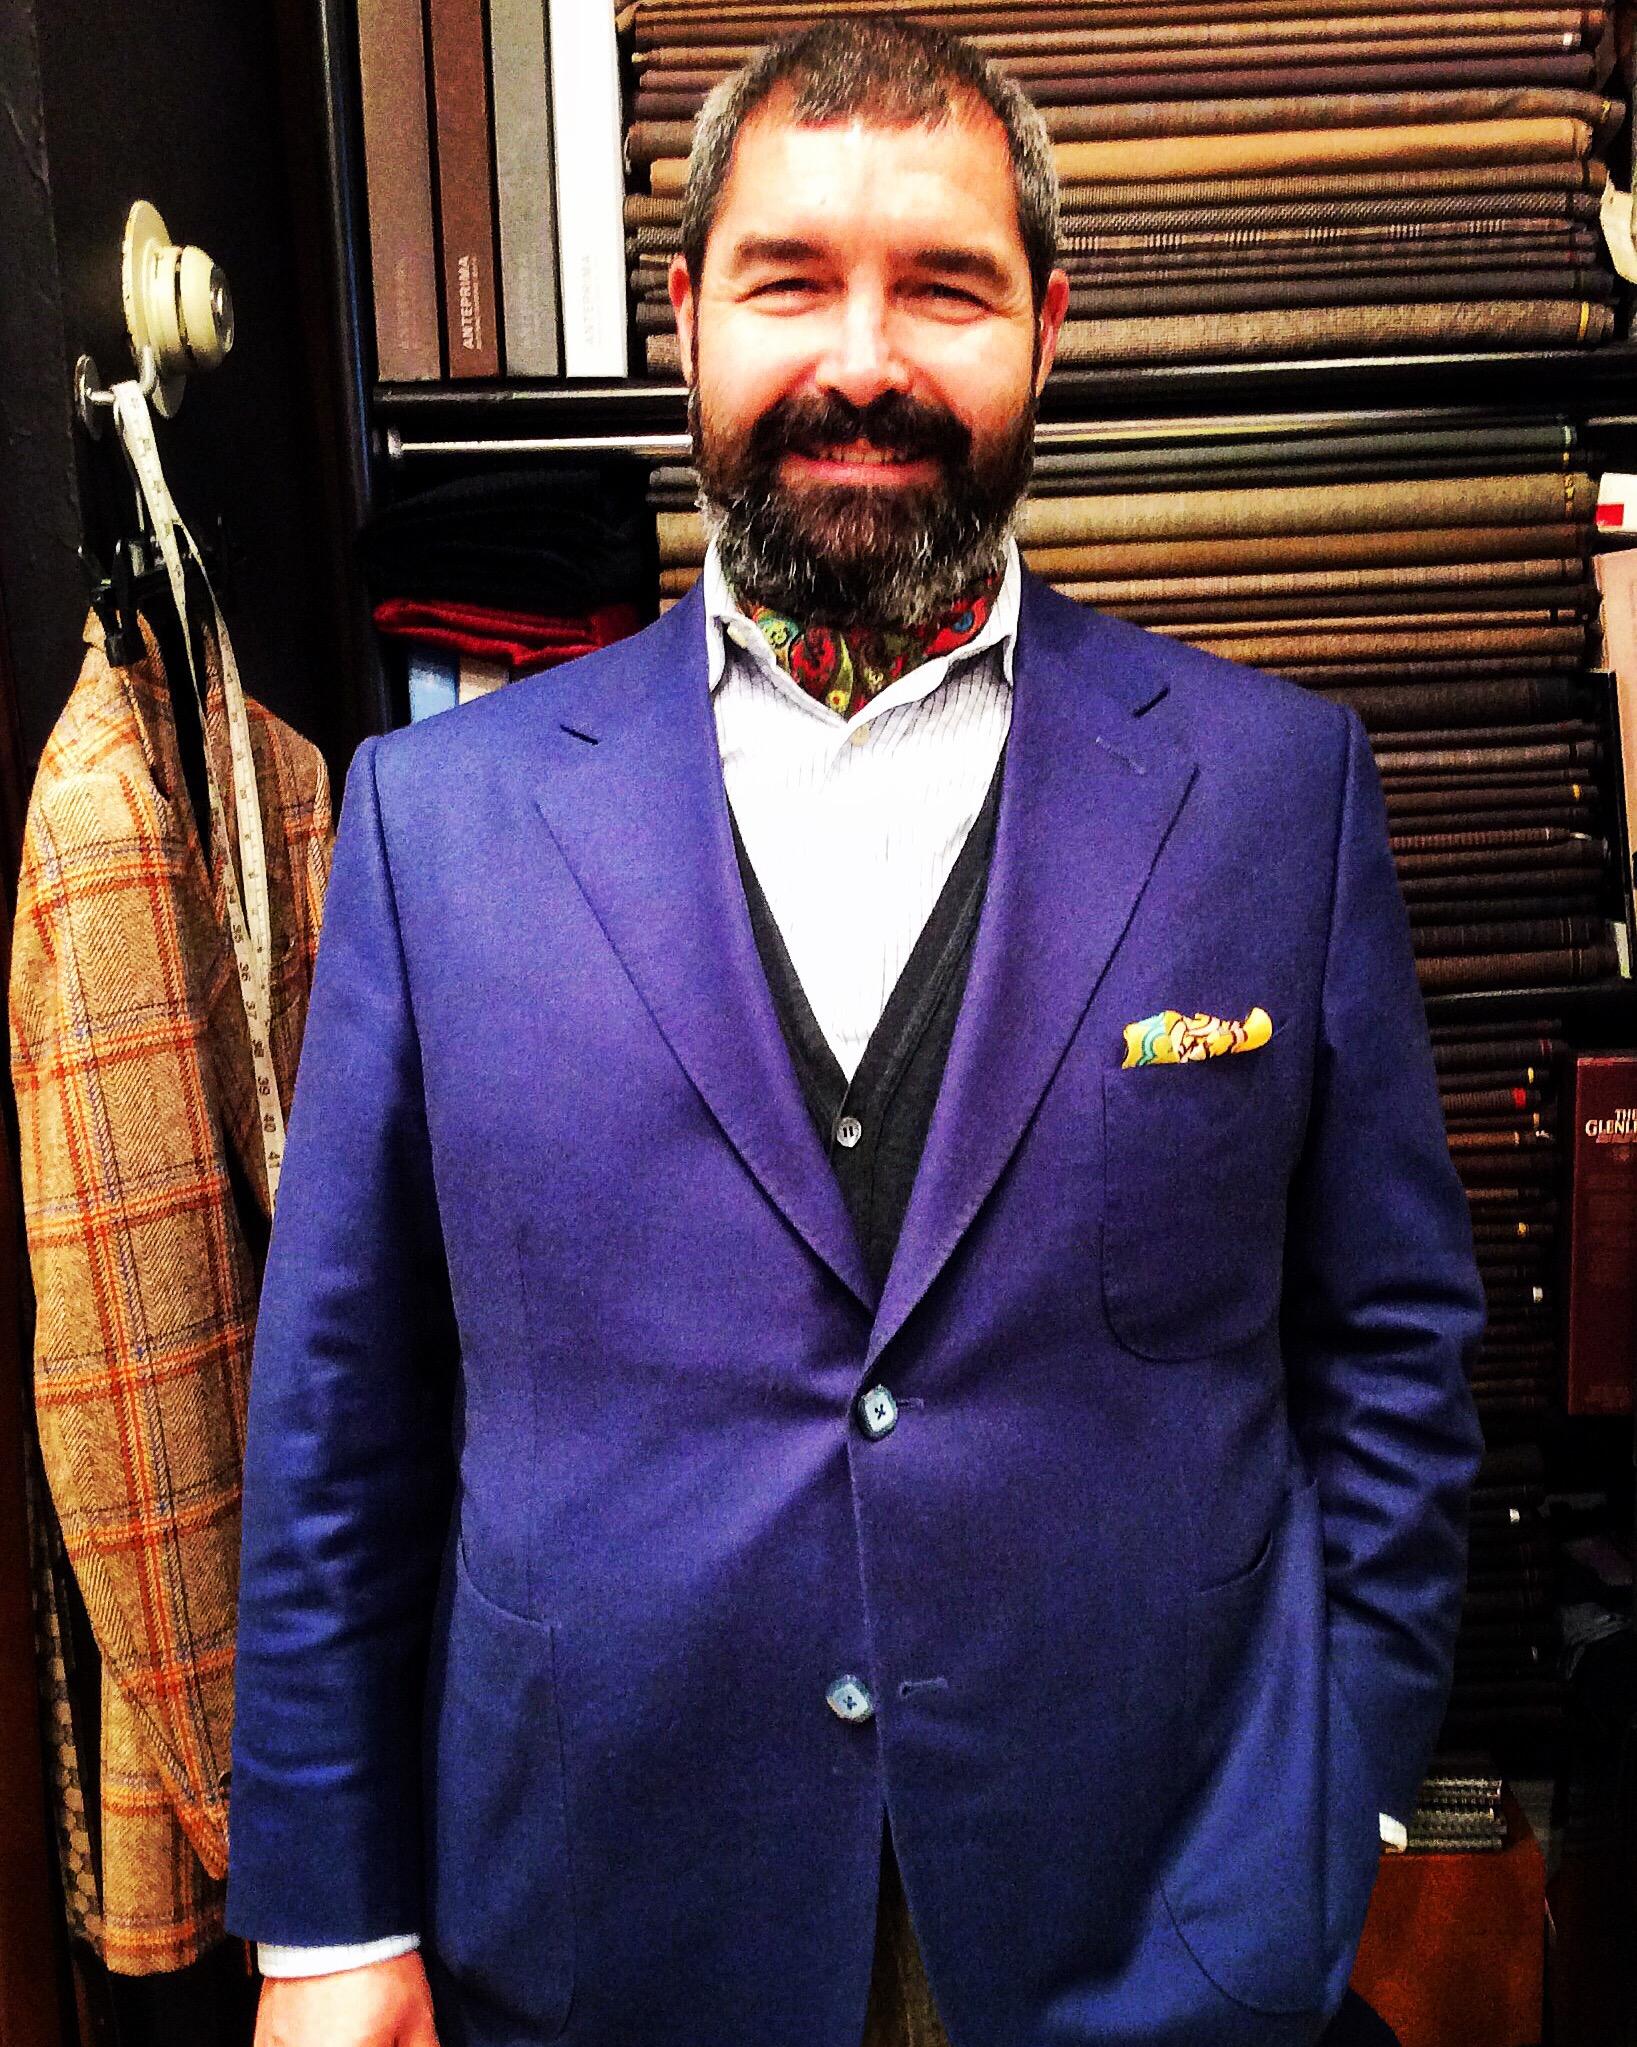 #suits #bespoketailoring #customtailoring #madetomeasure #handmadesuits #GQstyle #sartorial #italiandesigners #menwithstyle #sharpmagazine